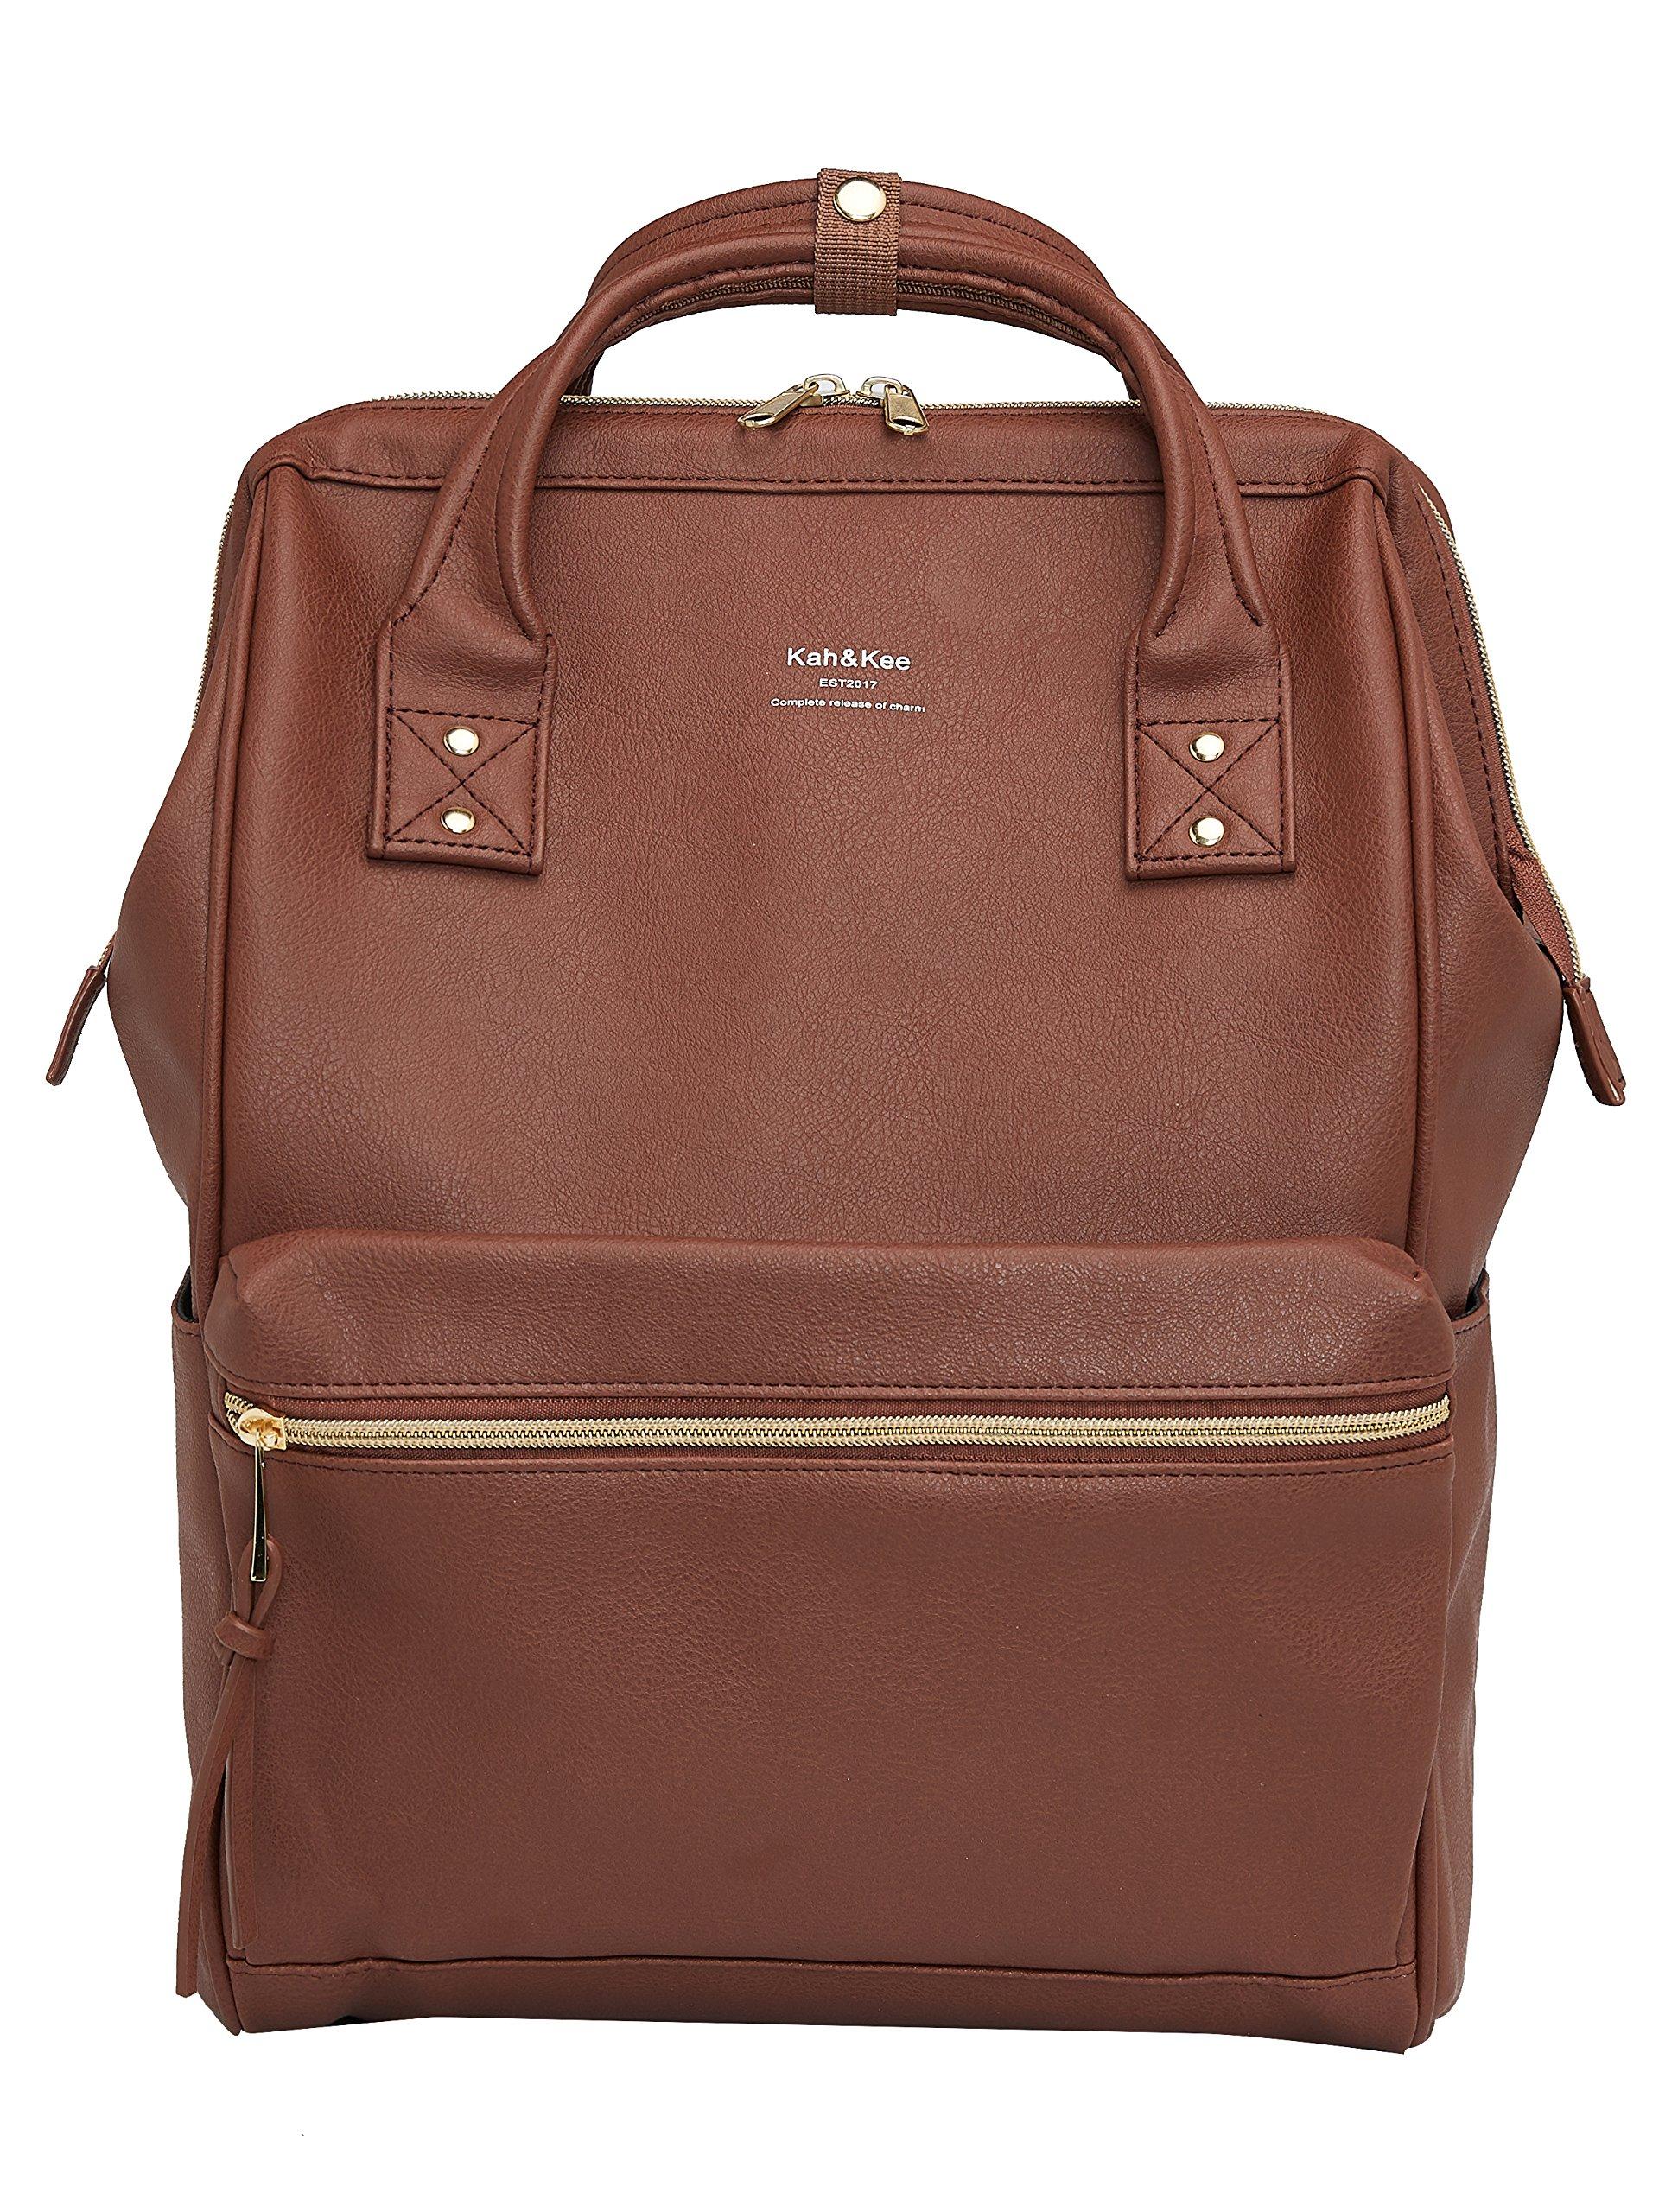 Kah&Kee Leather Travel Notebook Backpack Laptop School Diaper Bag for Women Man (Brown)